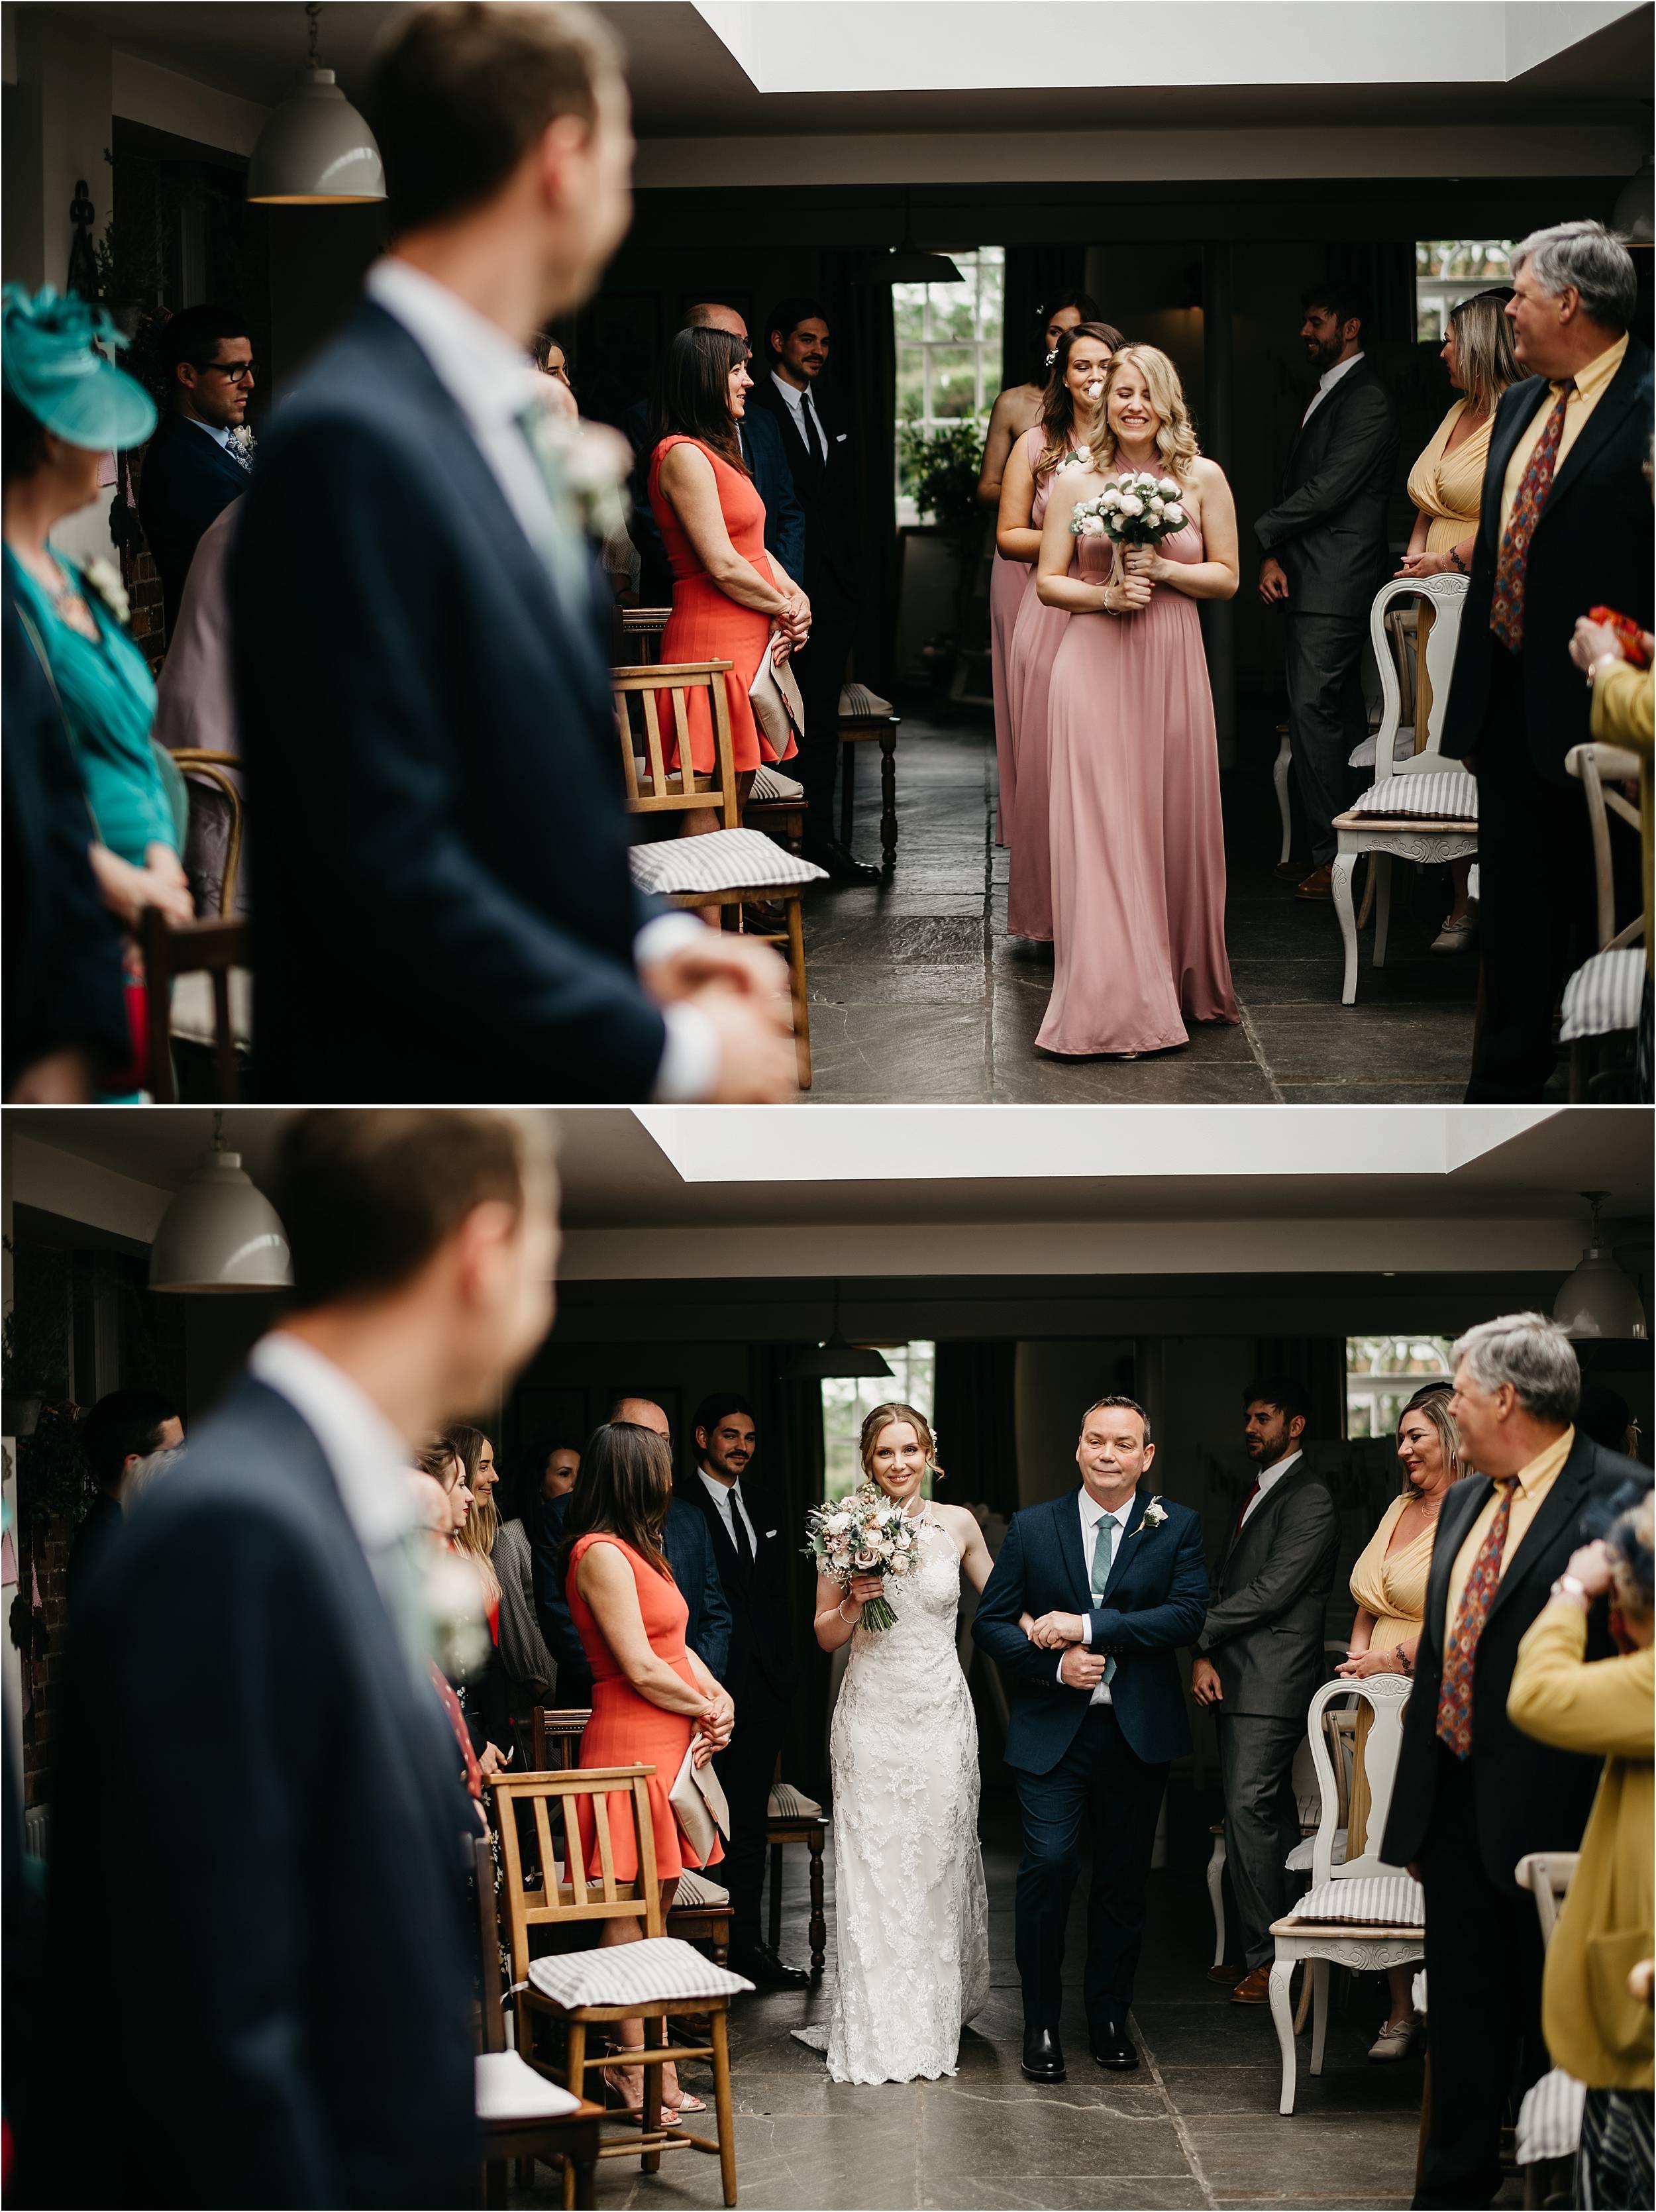 Kedleston Country House Wedding Photography_0046.jpg